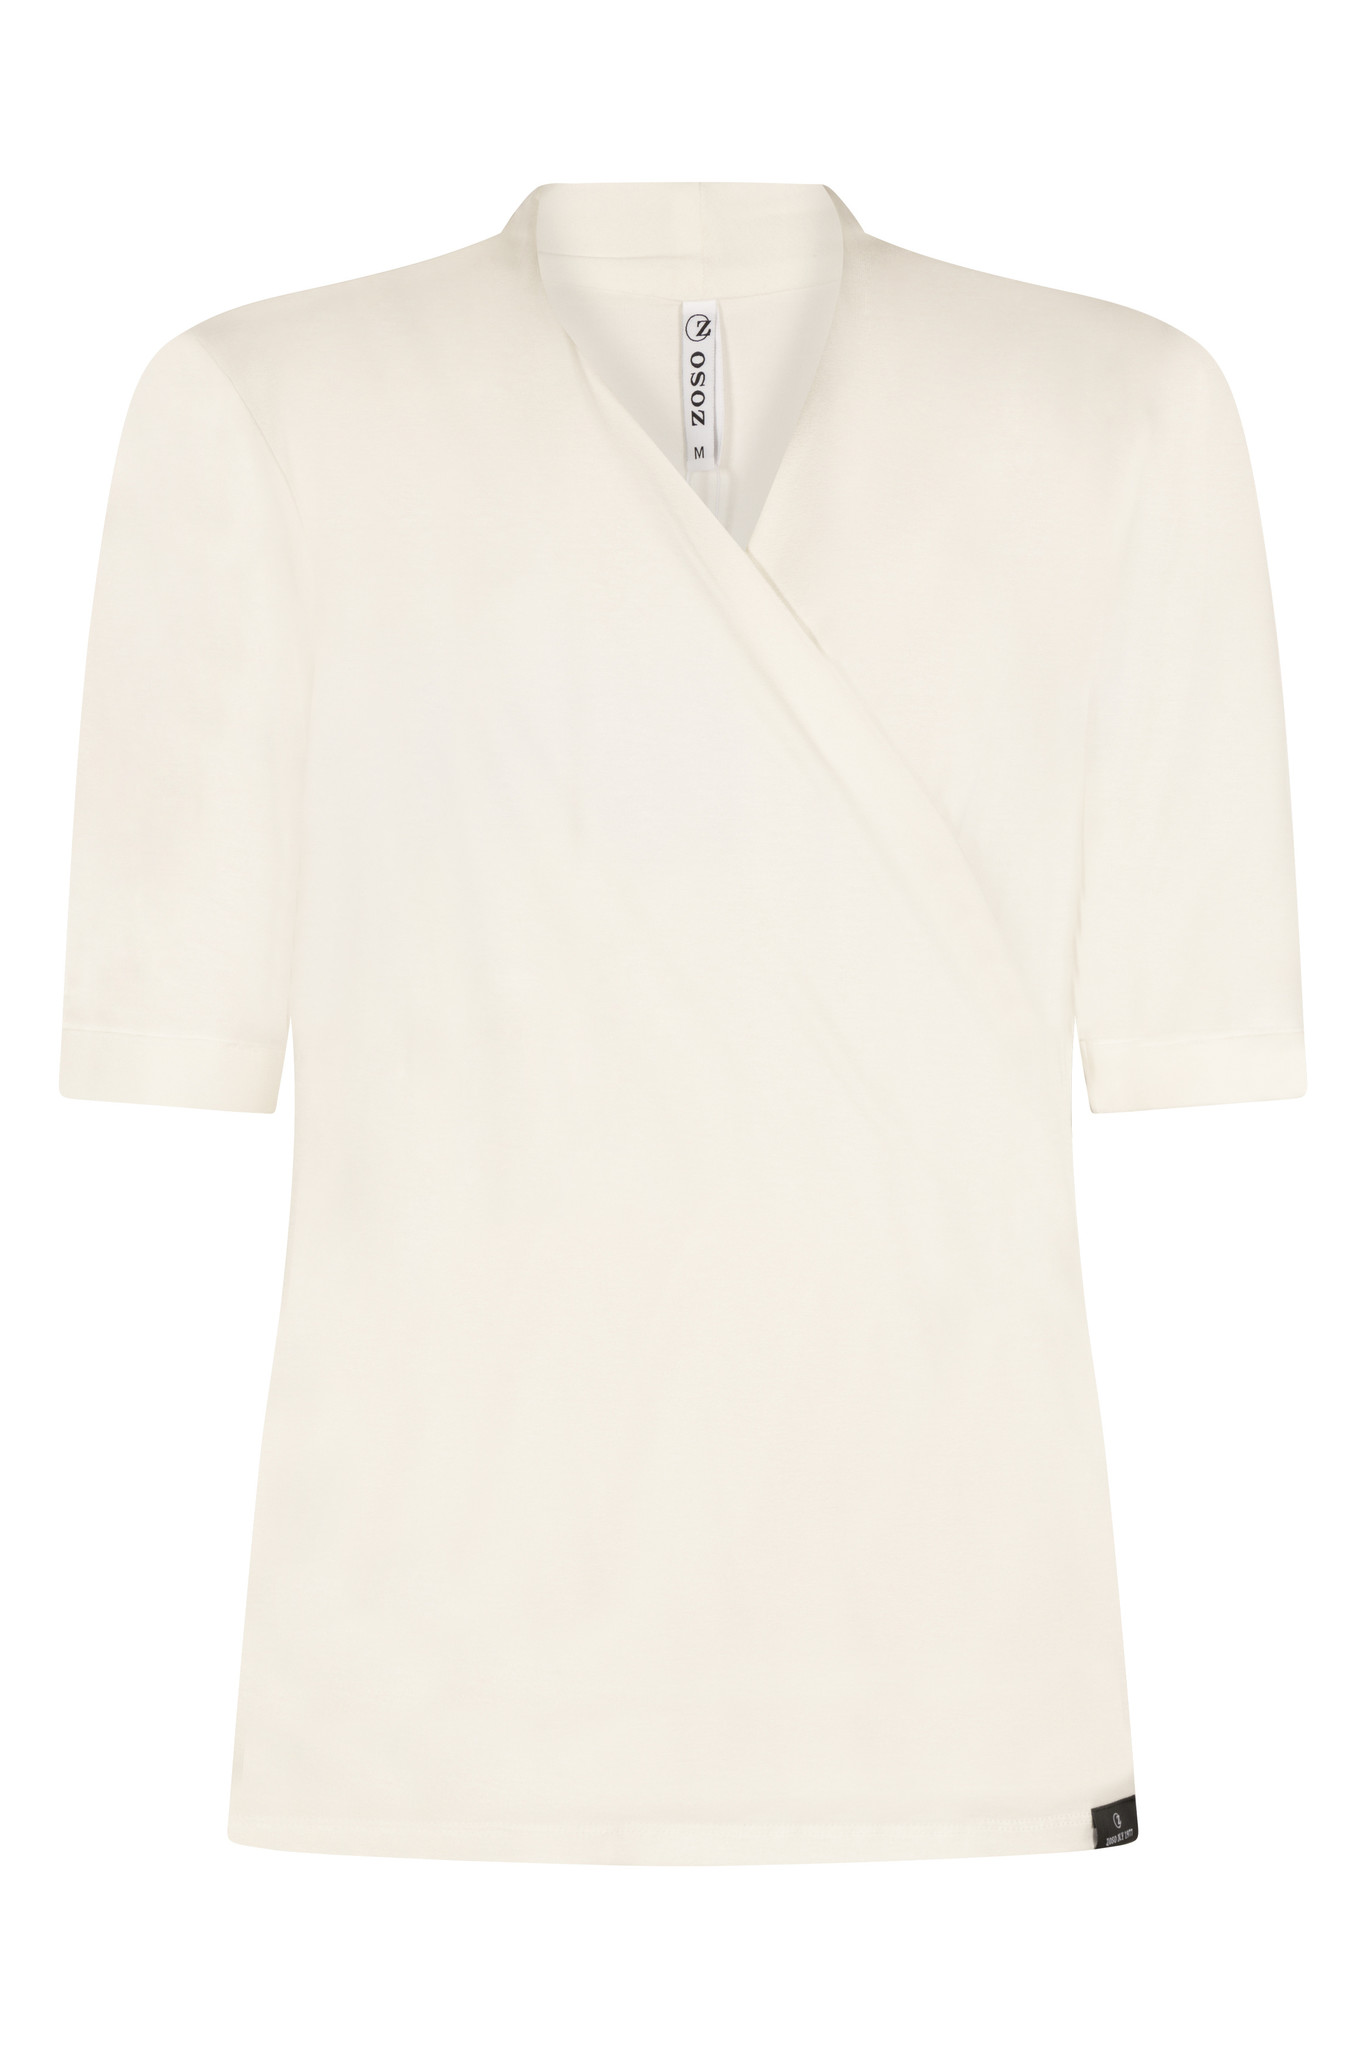 Zoso Zoso Dana Luxury viscose blouse off white